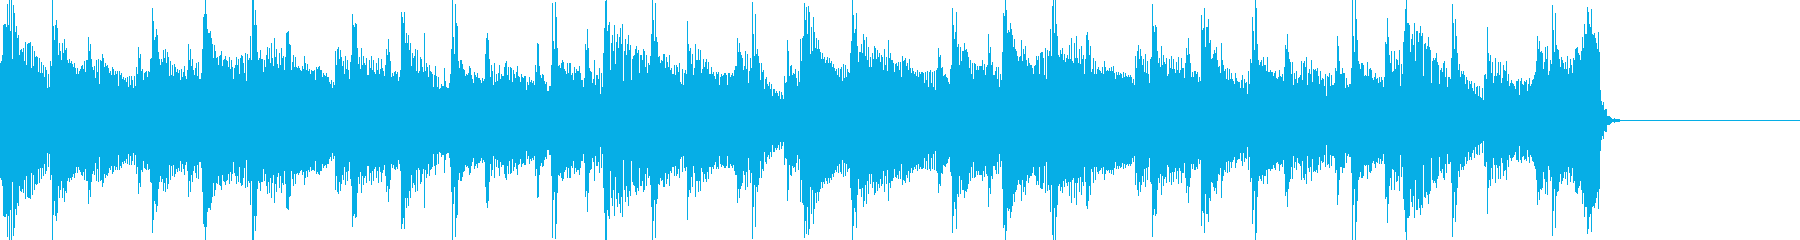 Happy Ukulele 13の再生済みの波形